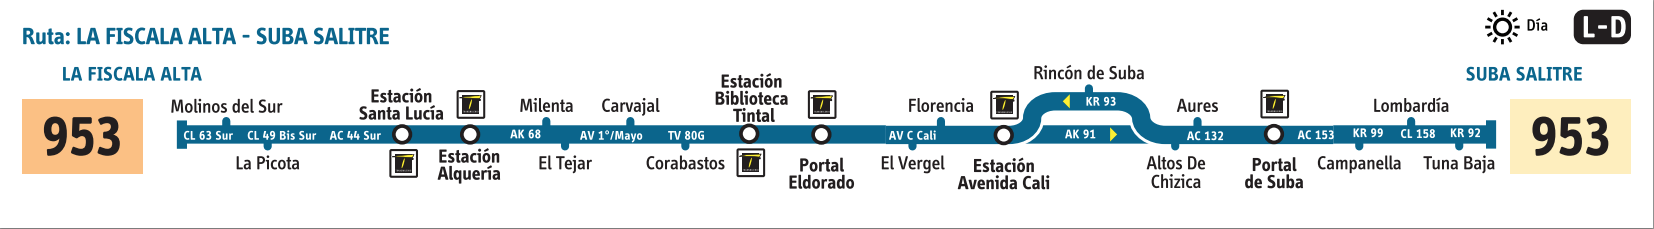 Ruta SITP: 953 La Fiscala Alta ↔ Suba Salitre [Urbana] 2